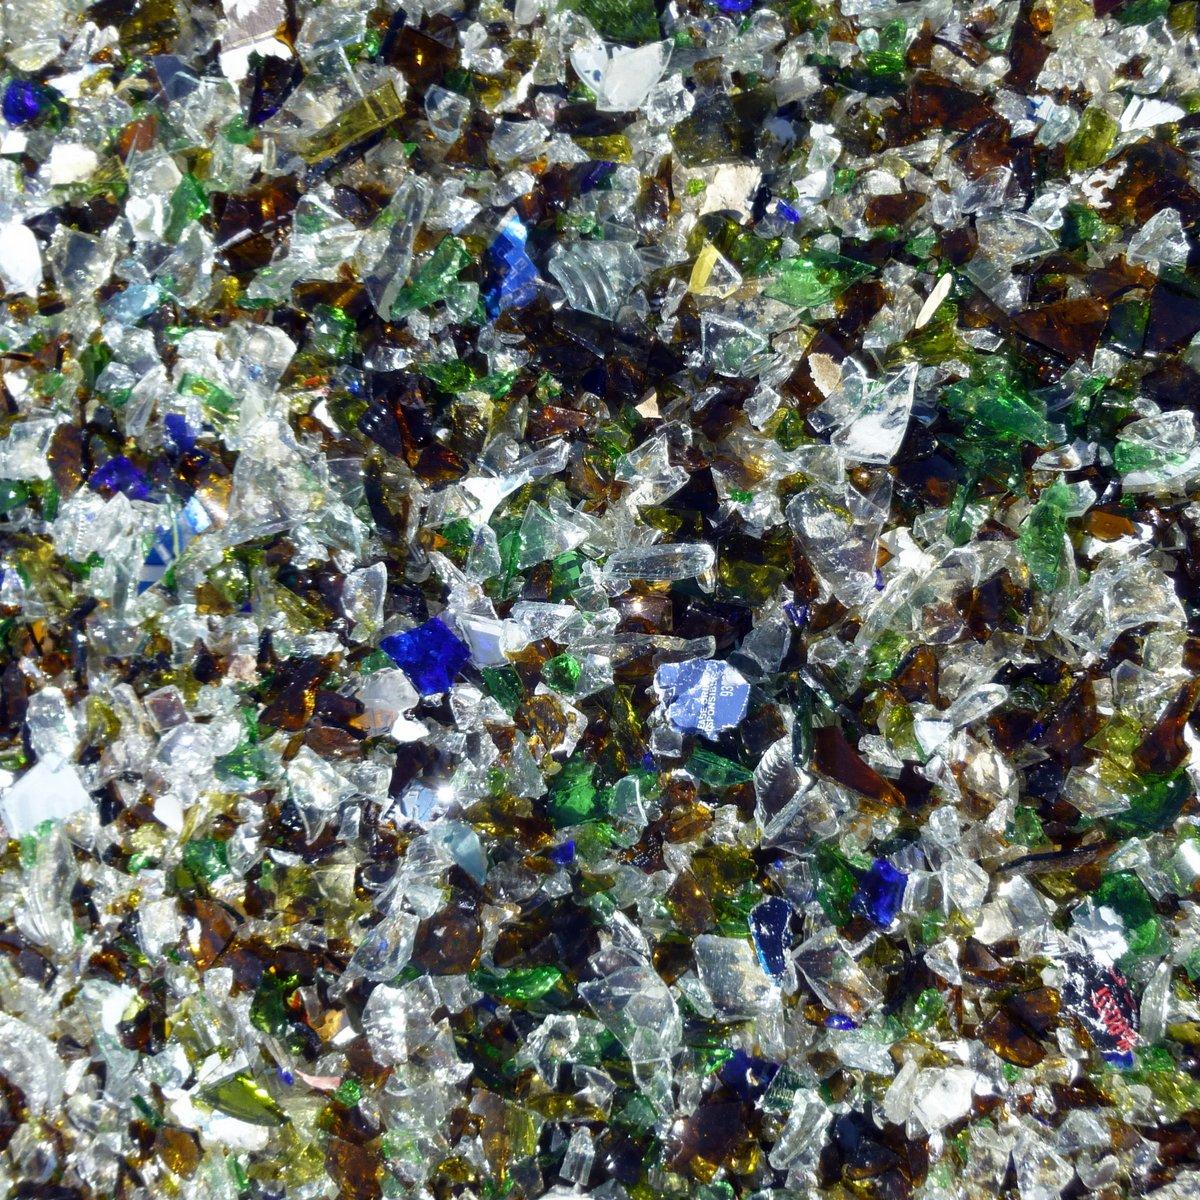 9. Crushed Glass